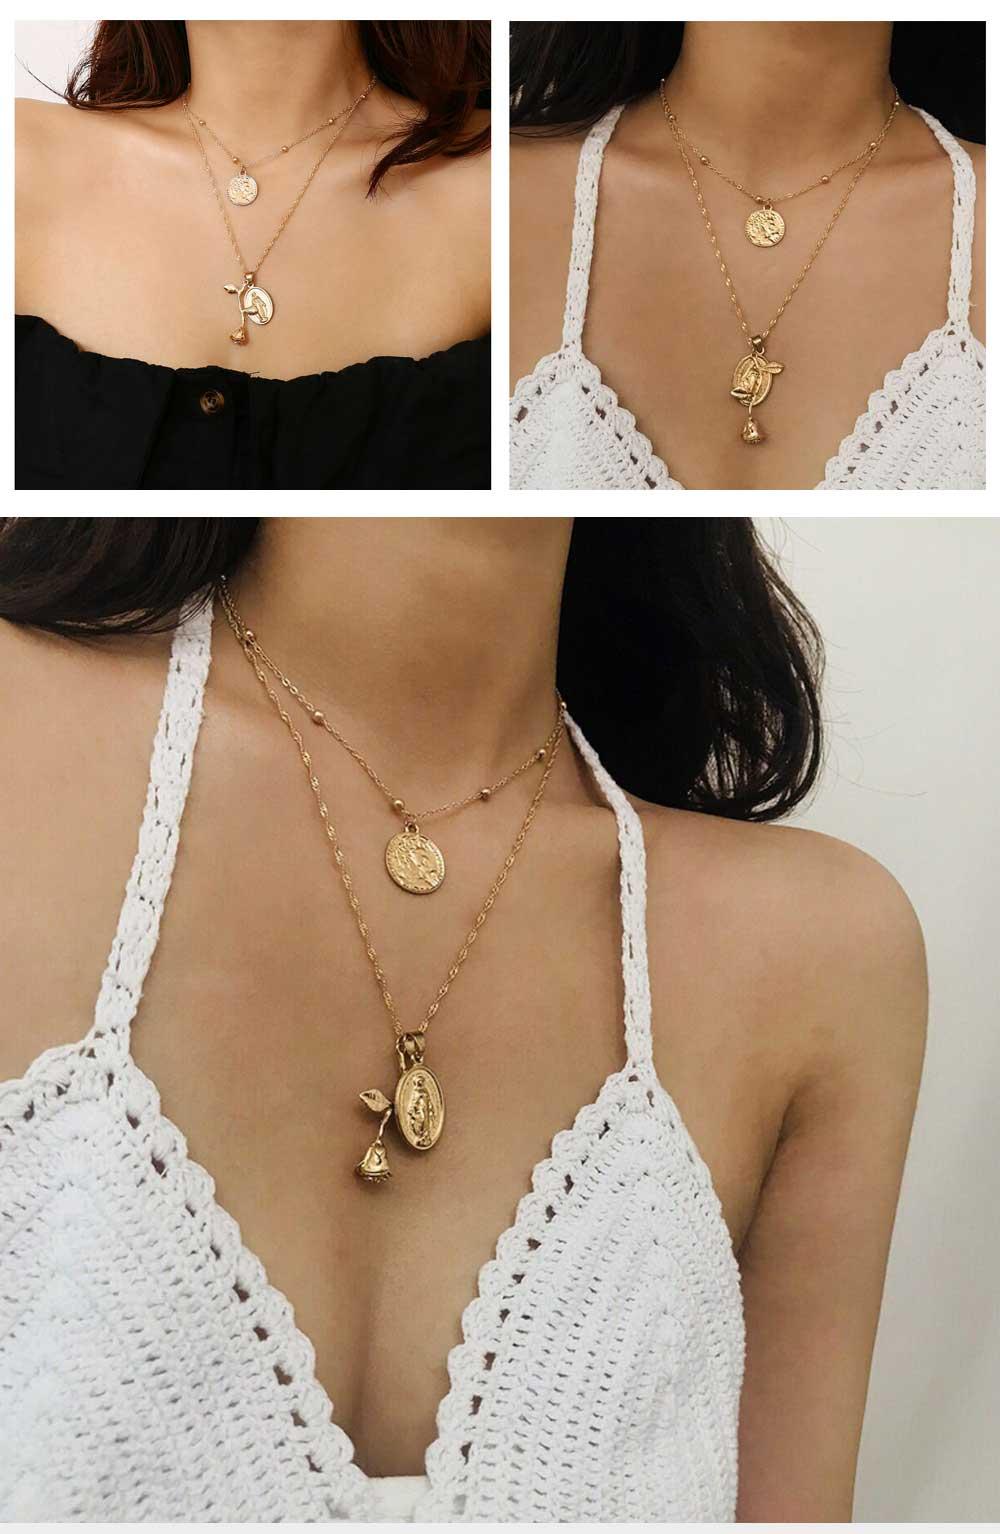 Women Alloy Pendant Necklace, Multi-layer Retro Rose & Jesus Pendant Accessory Necklace Beauty Accessory Gold Silver 2 Colors 5